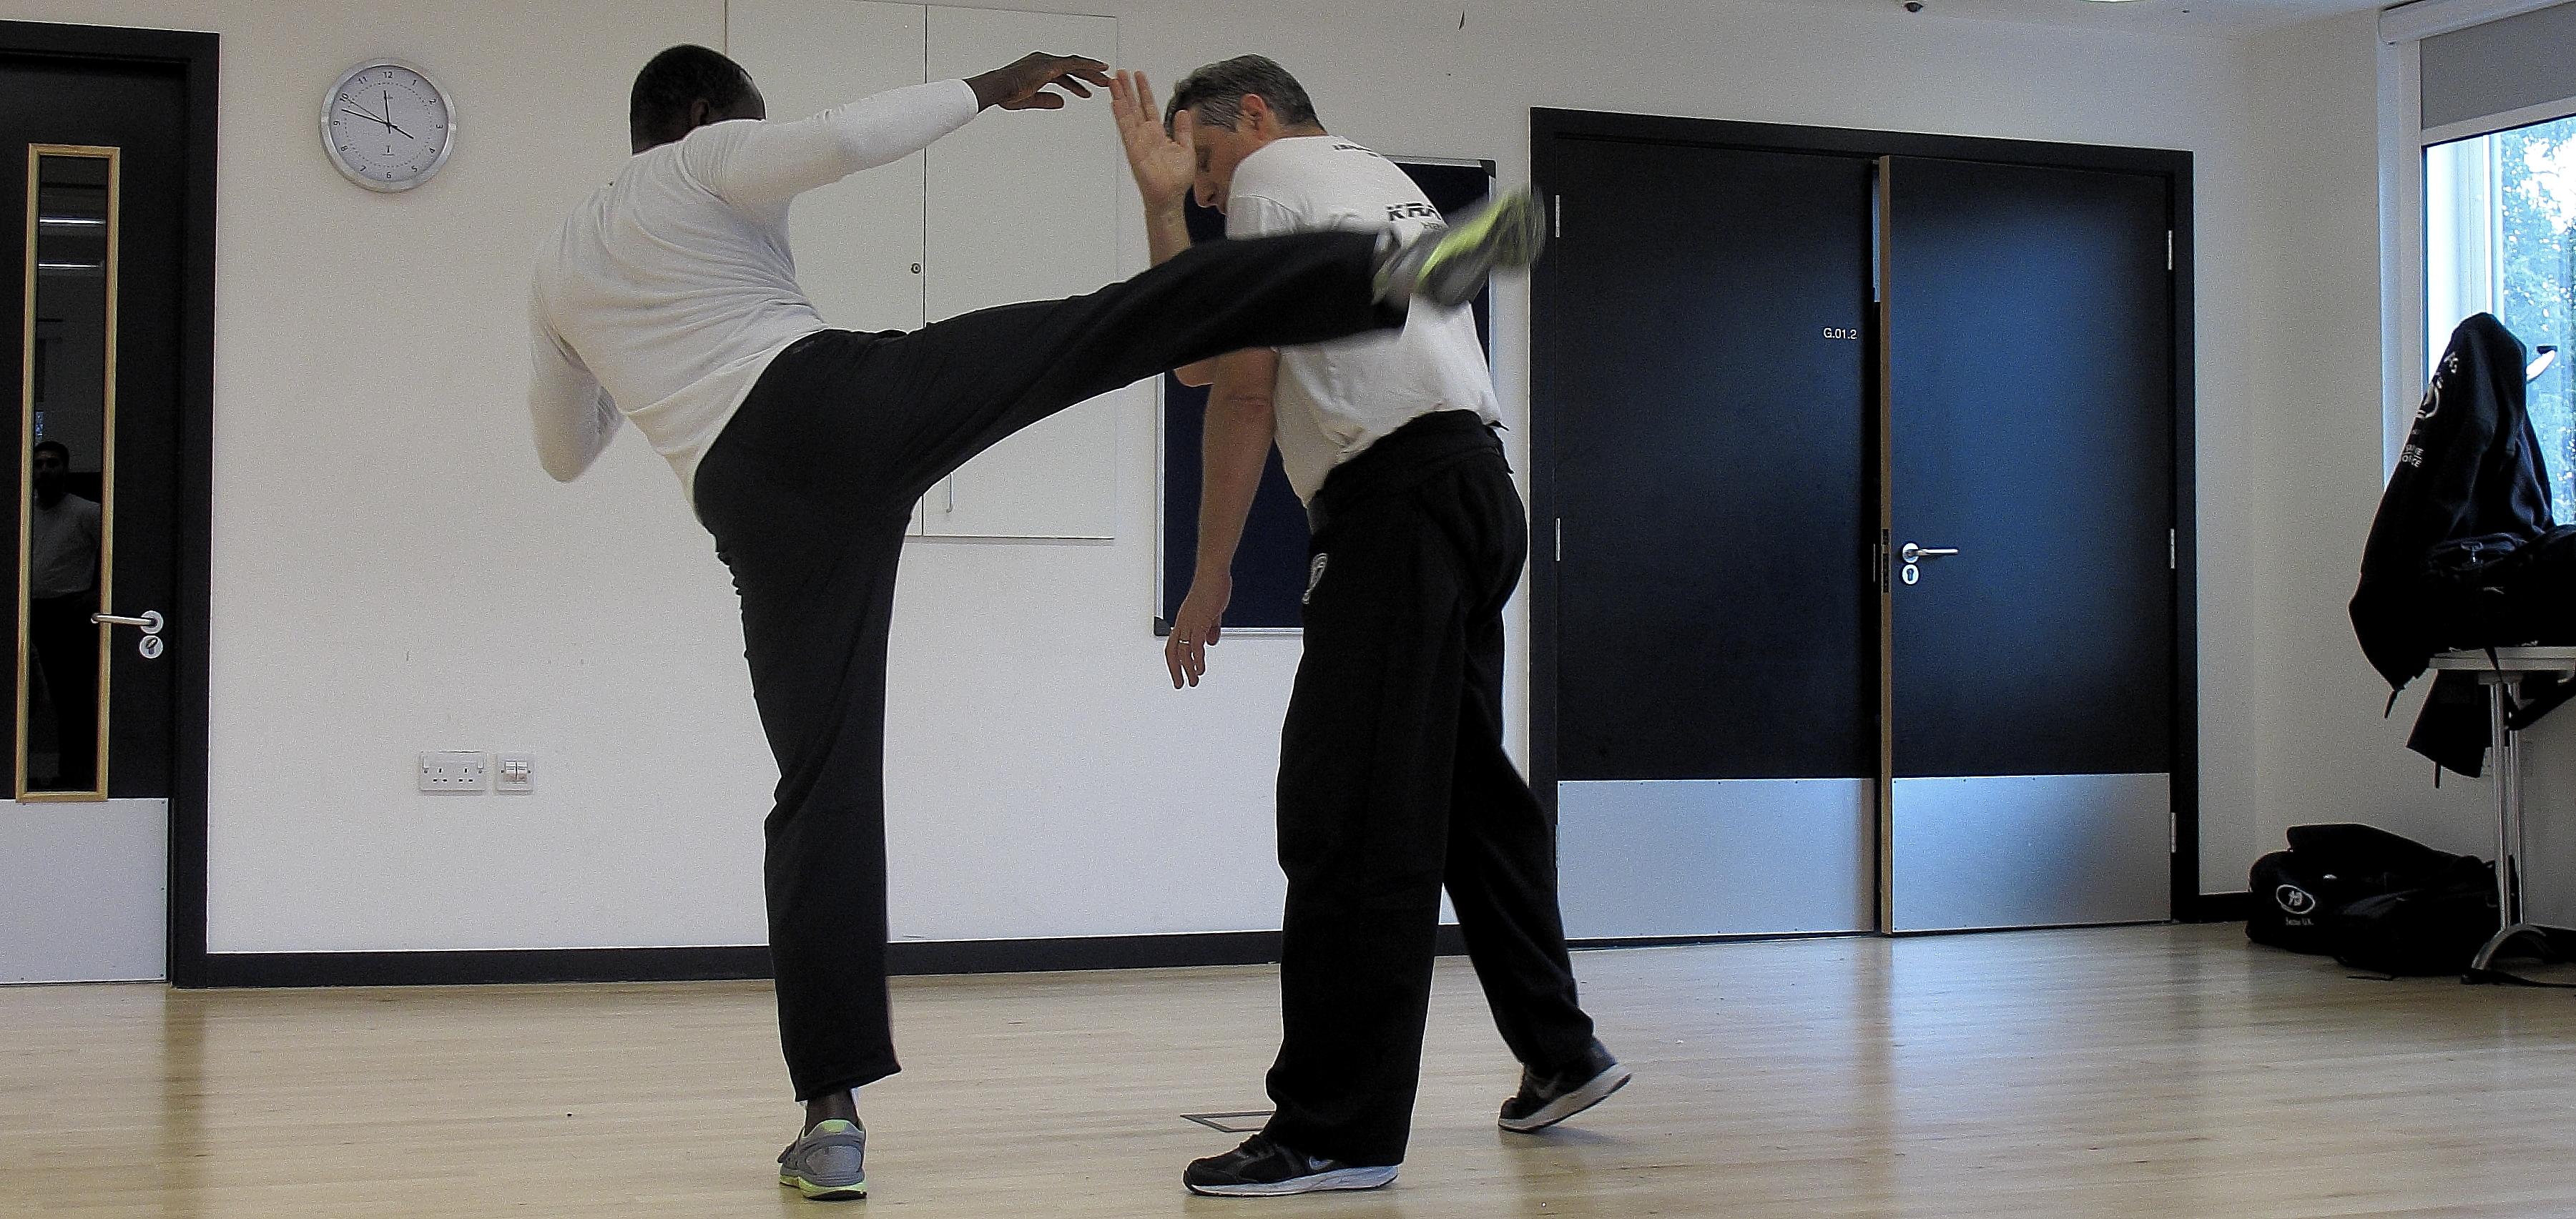 Krav maga training south london with Eitan